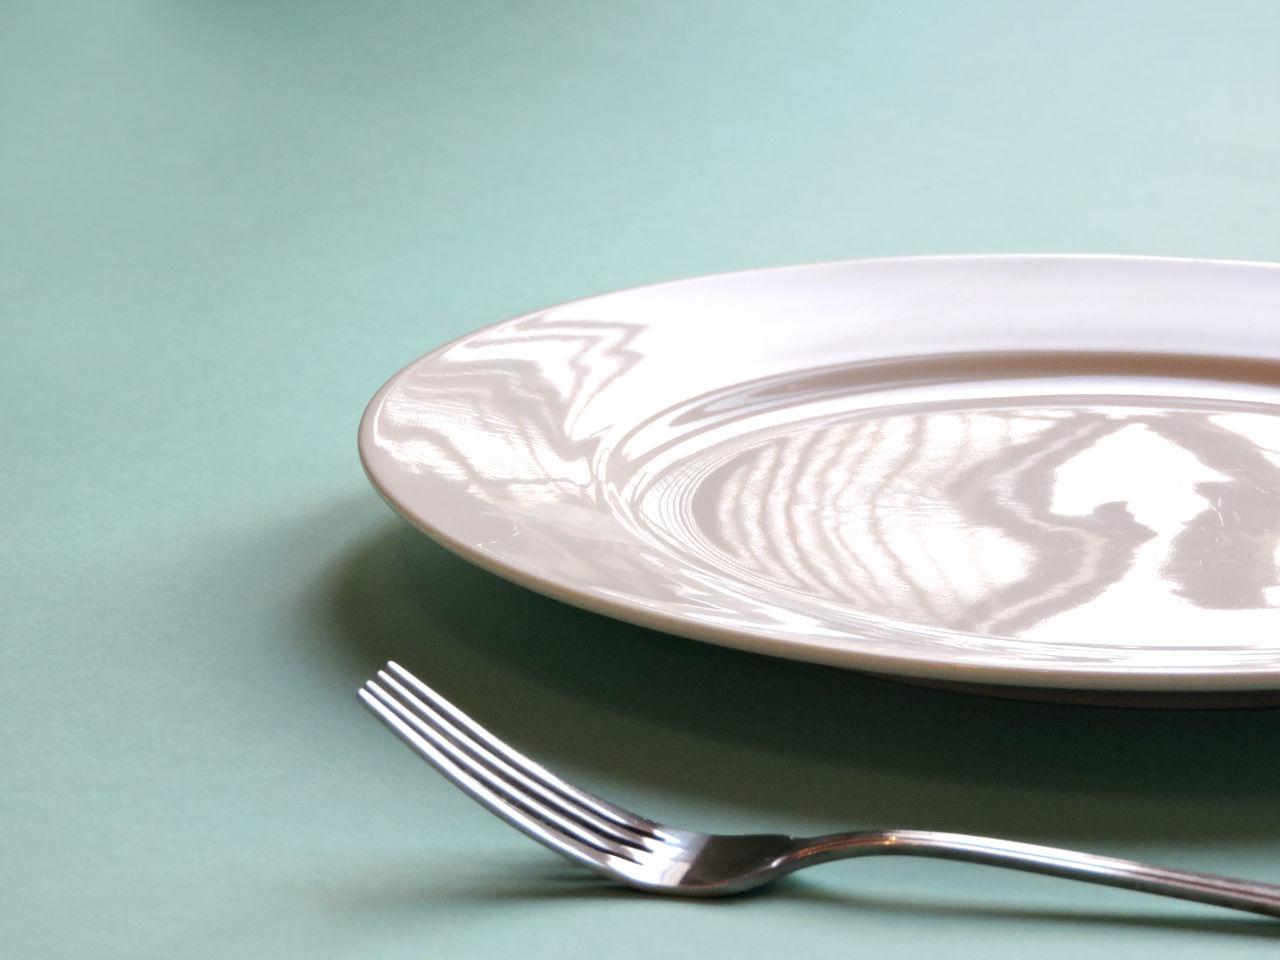 Blue Background Cutlery Dinner Plate Fork Knife Plate Studio White Plate